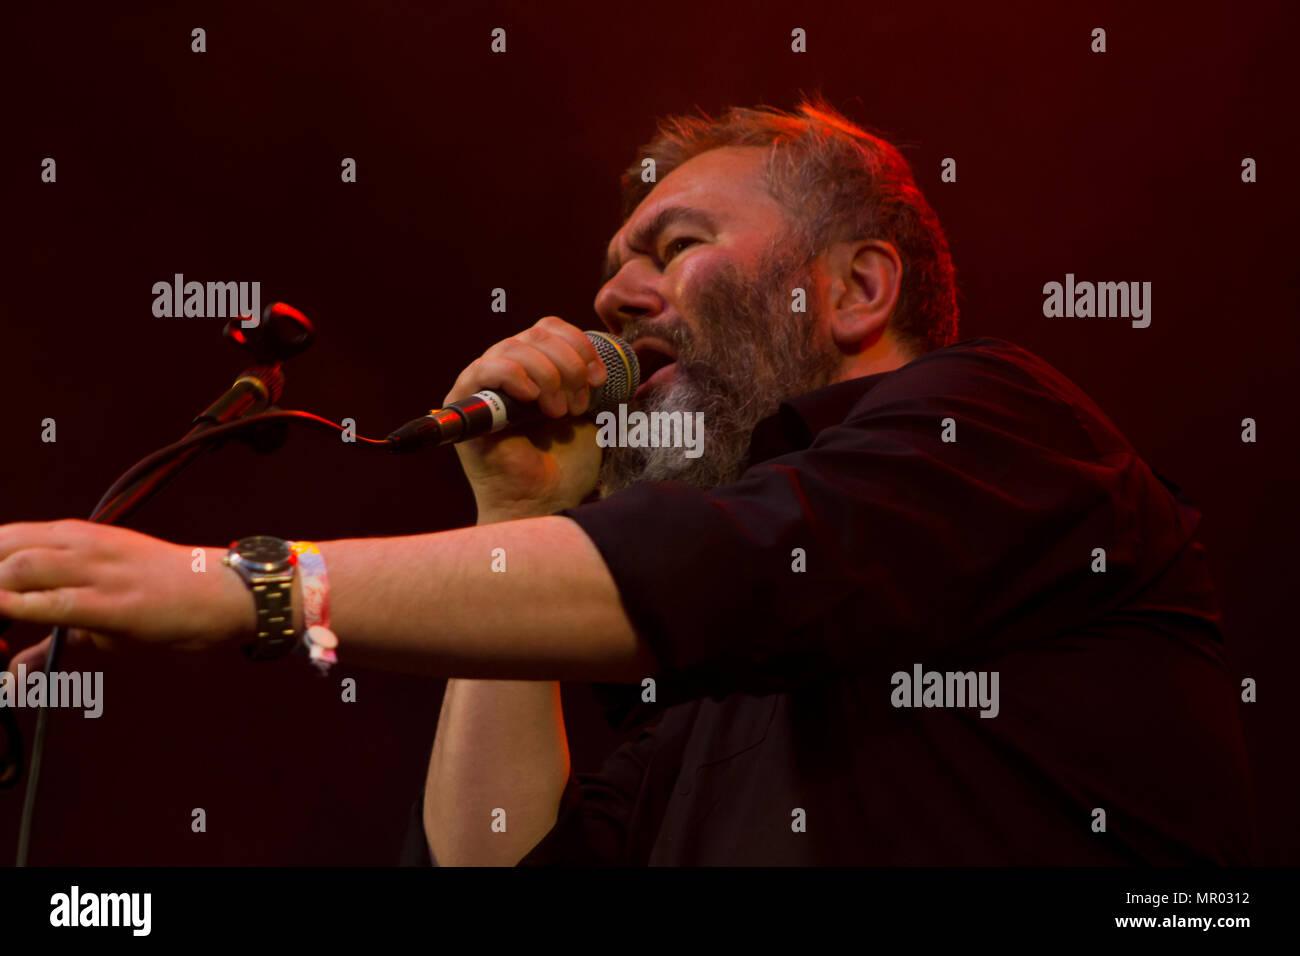 Arab Strap performin at music festival - Stock Image